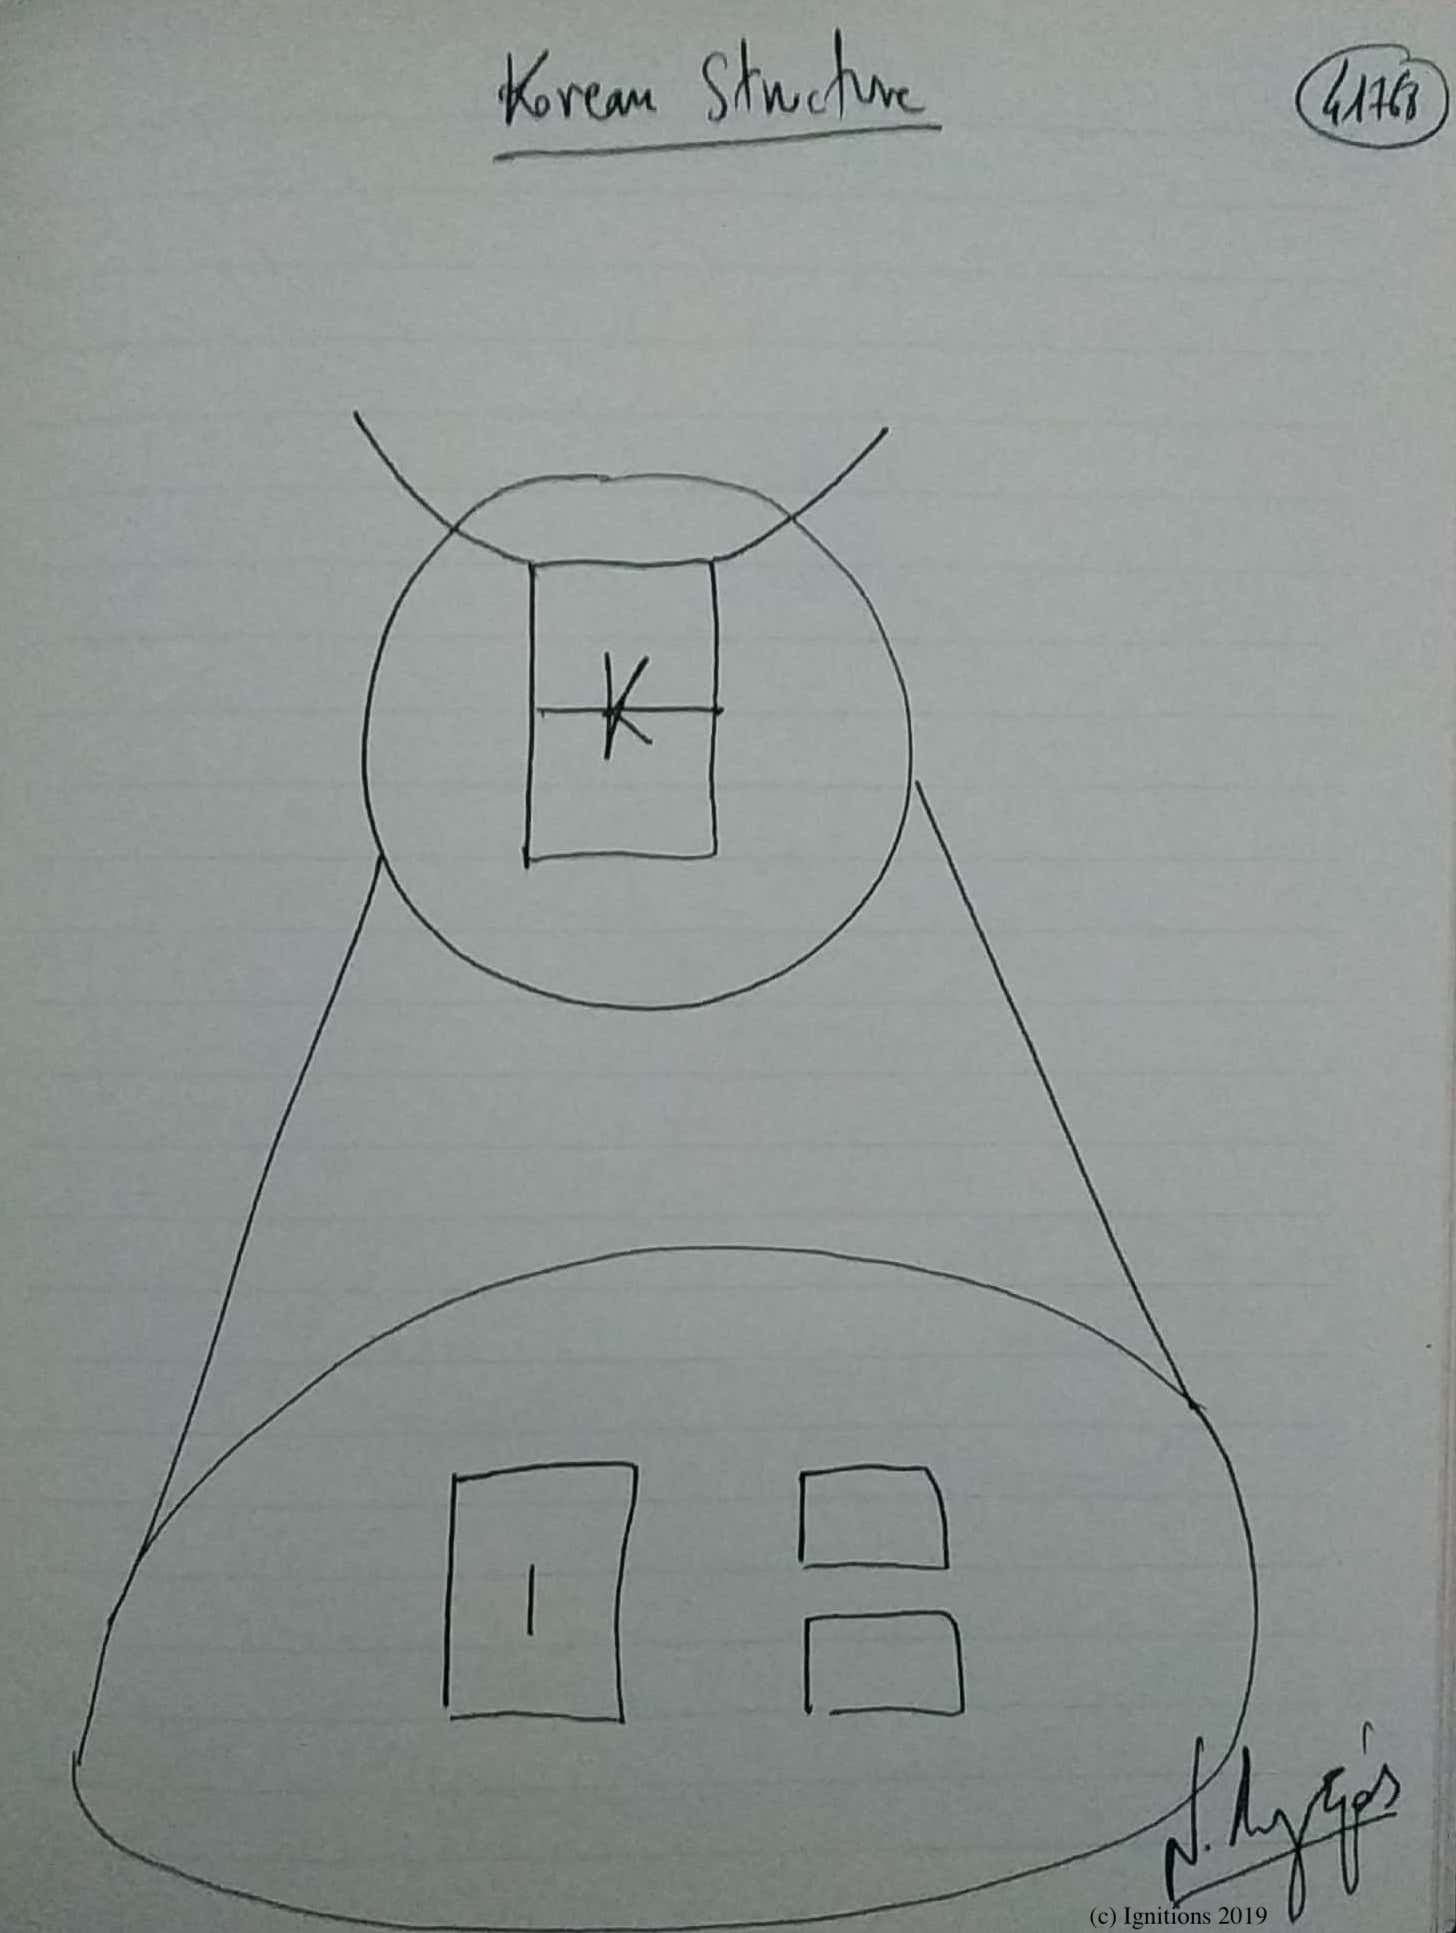 Korean Structure. (Dessin)